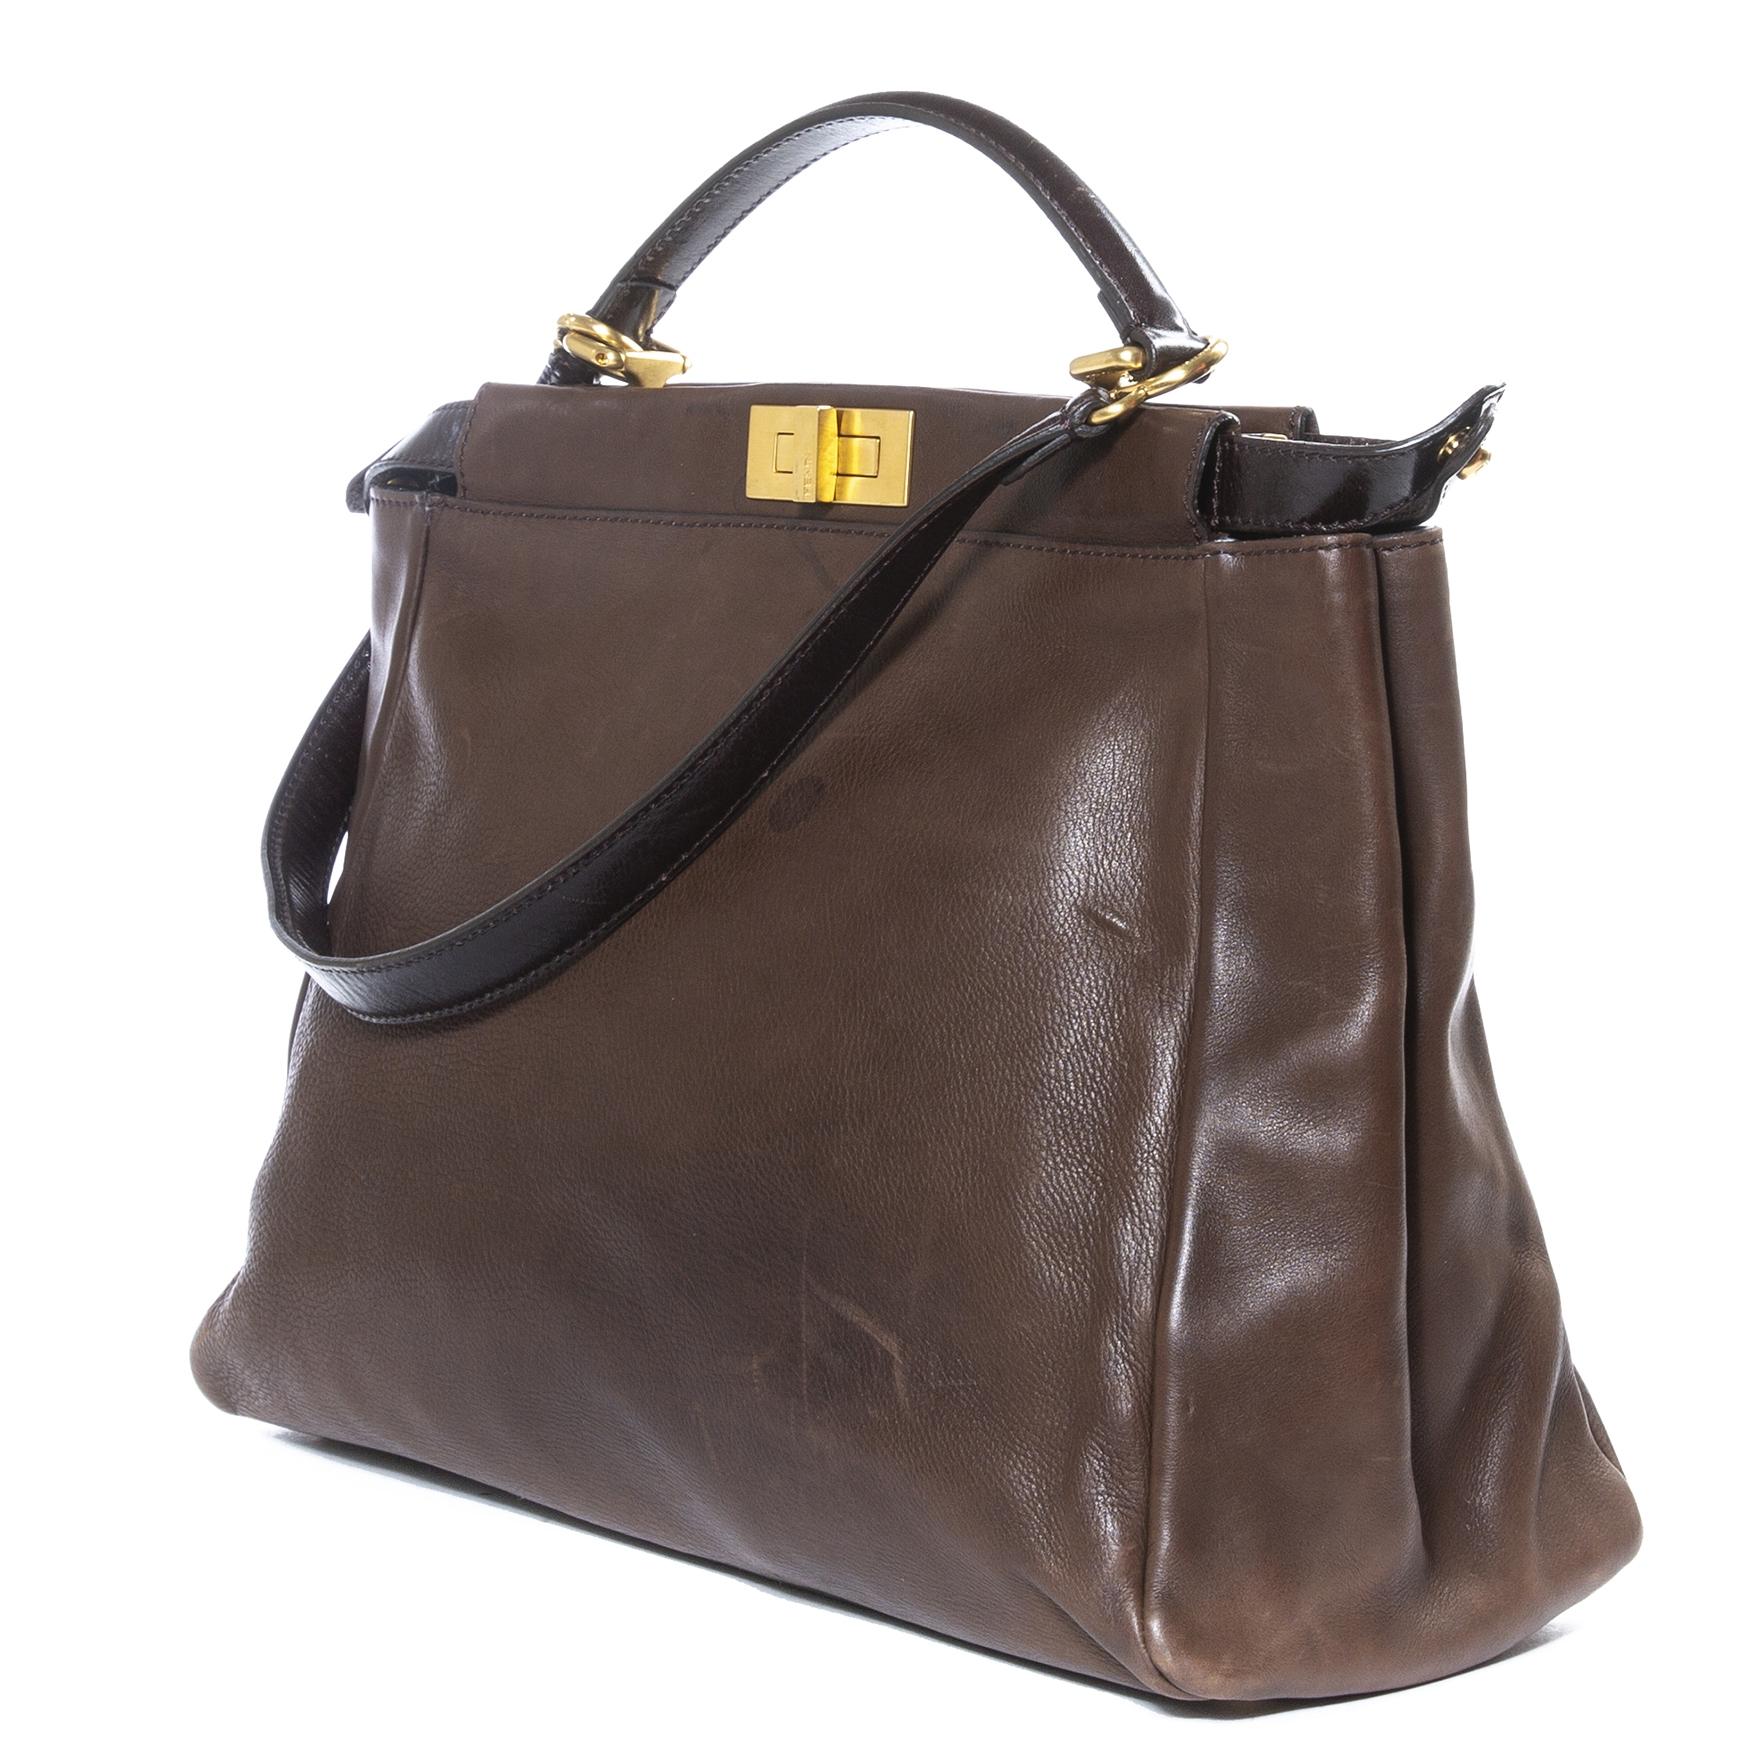 Fendi Peekaboo Brown Large Bag + Strap